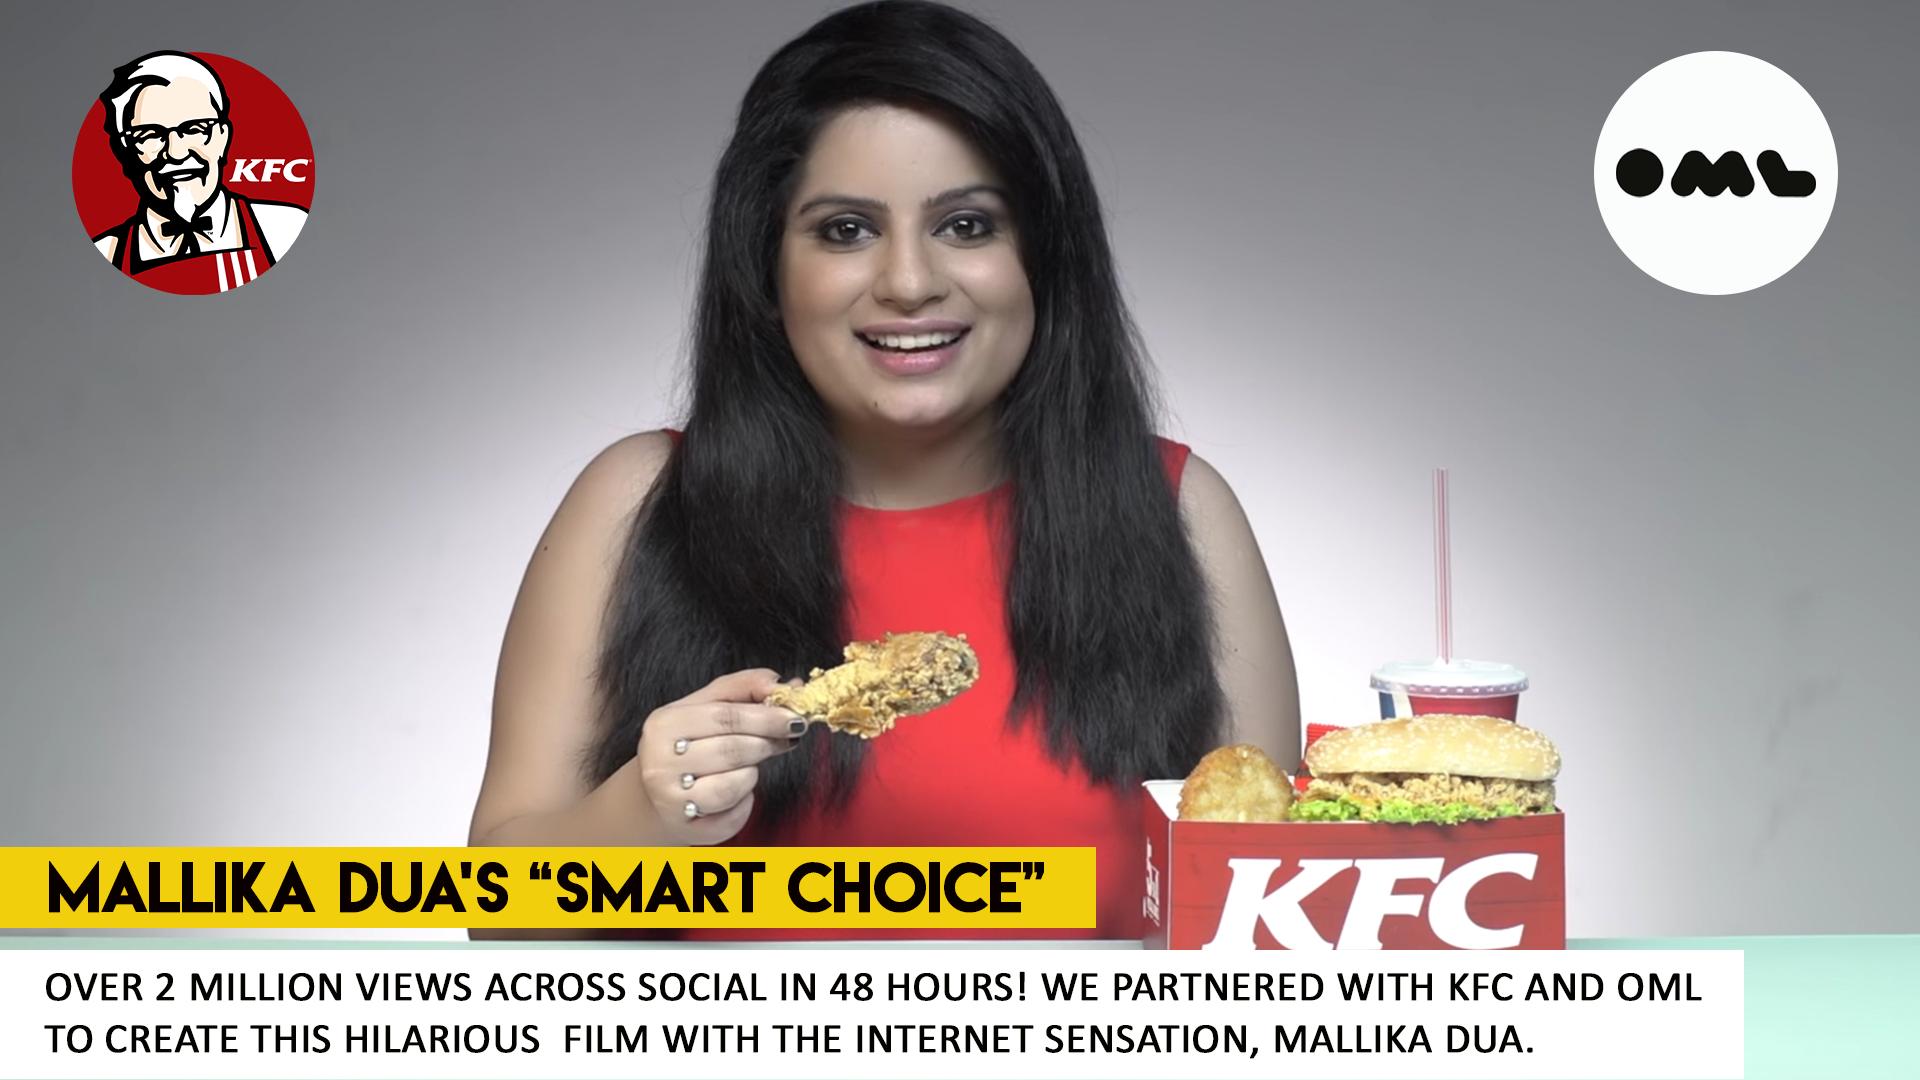 KFC Advertisement with Mallika Dua - What Works